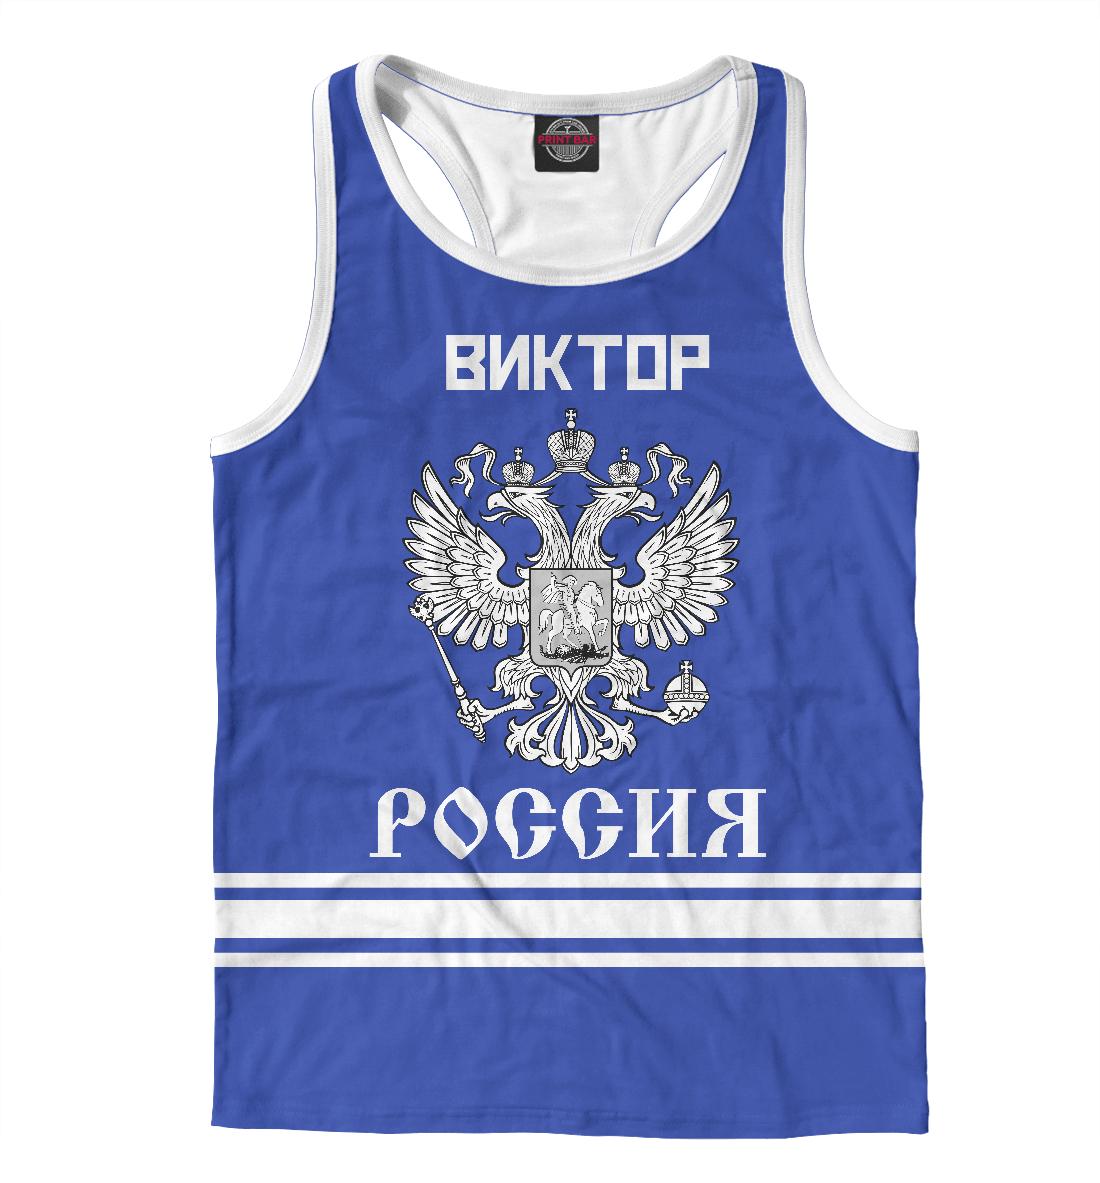 Купить ВИКТОР sport russia collection, Printbar, Майки борцовки, VKT-521173-mayb-2